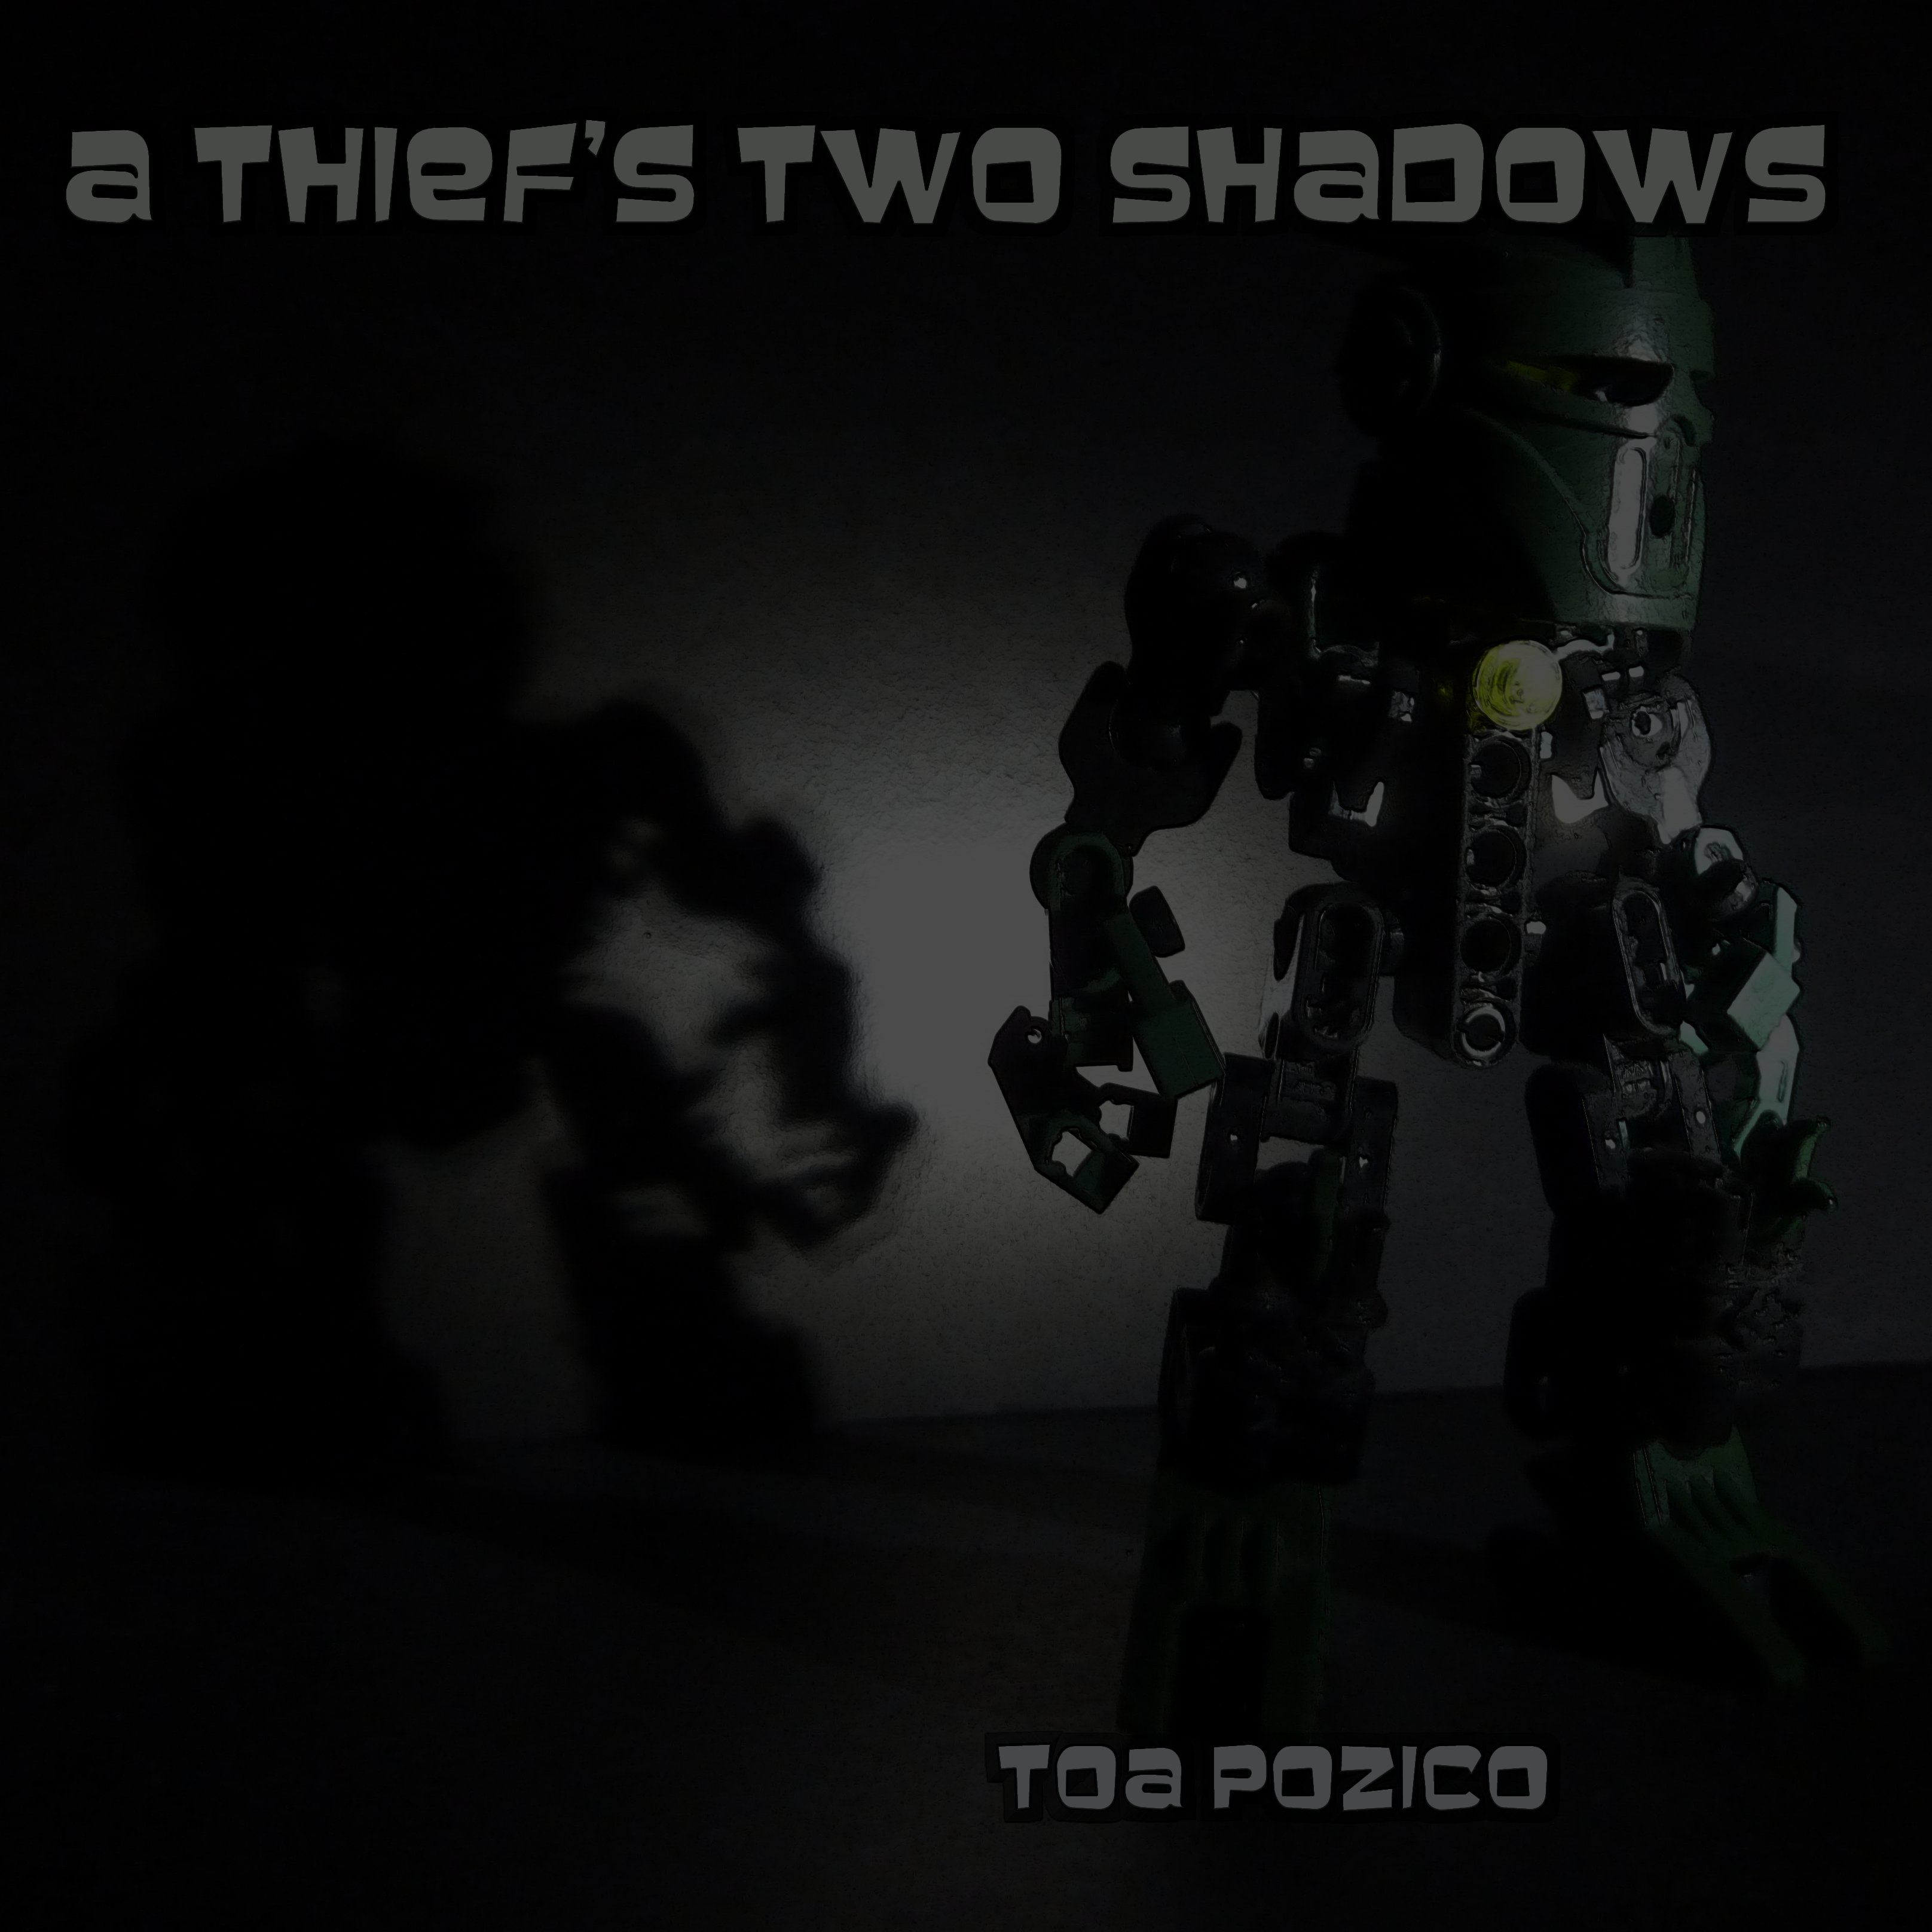 A Thief's Two Shadows